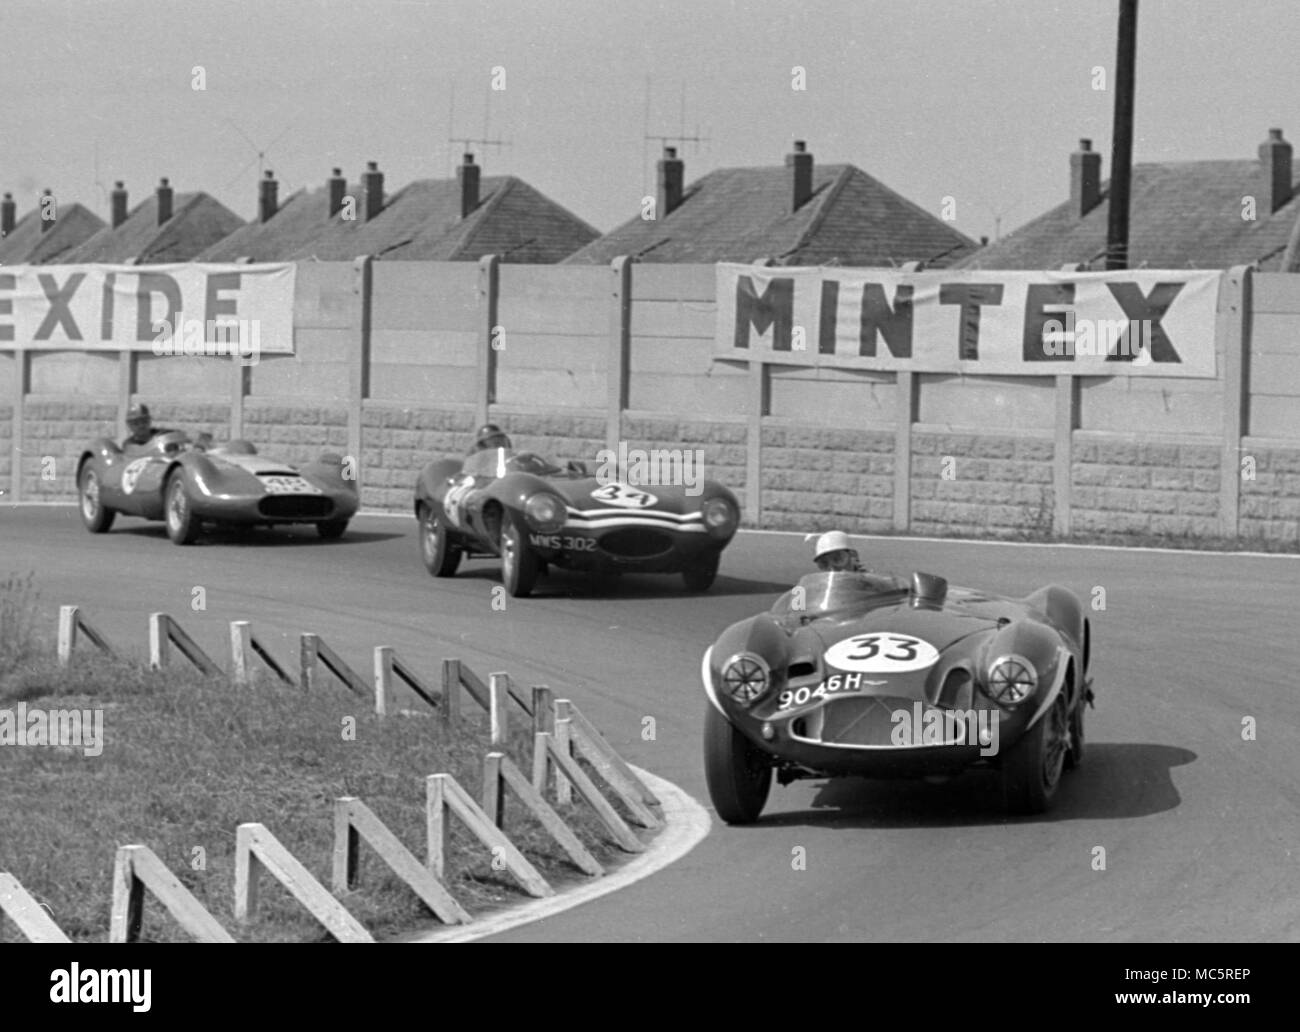 Aston Martin DB 3 S Roy Salvadori, Aintree BARC 100 Internationale 23/06/1956 Stockbild